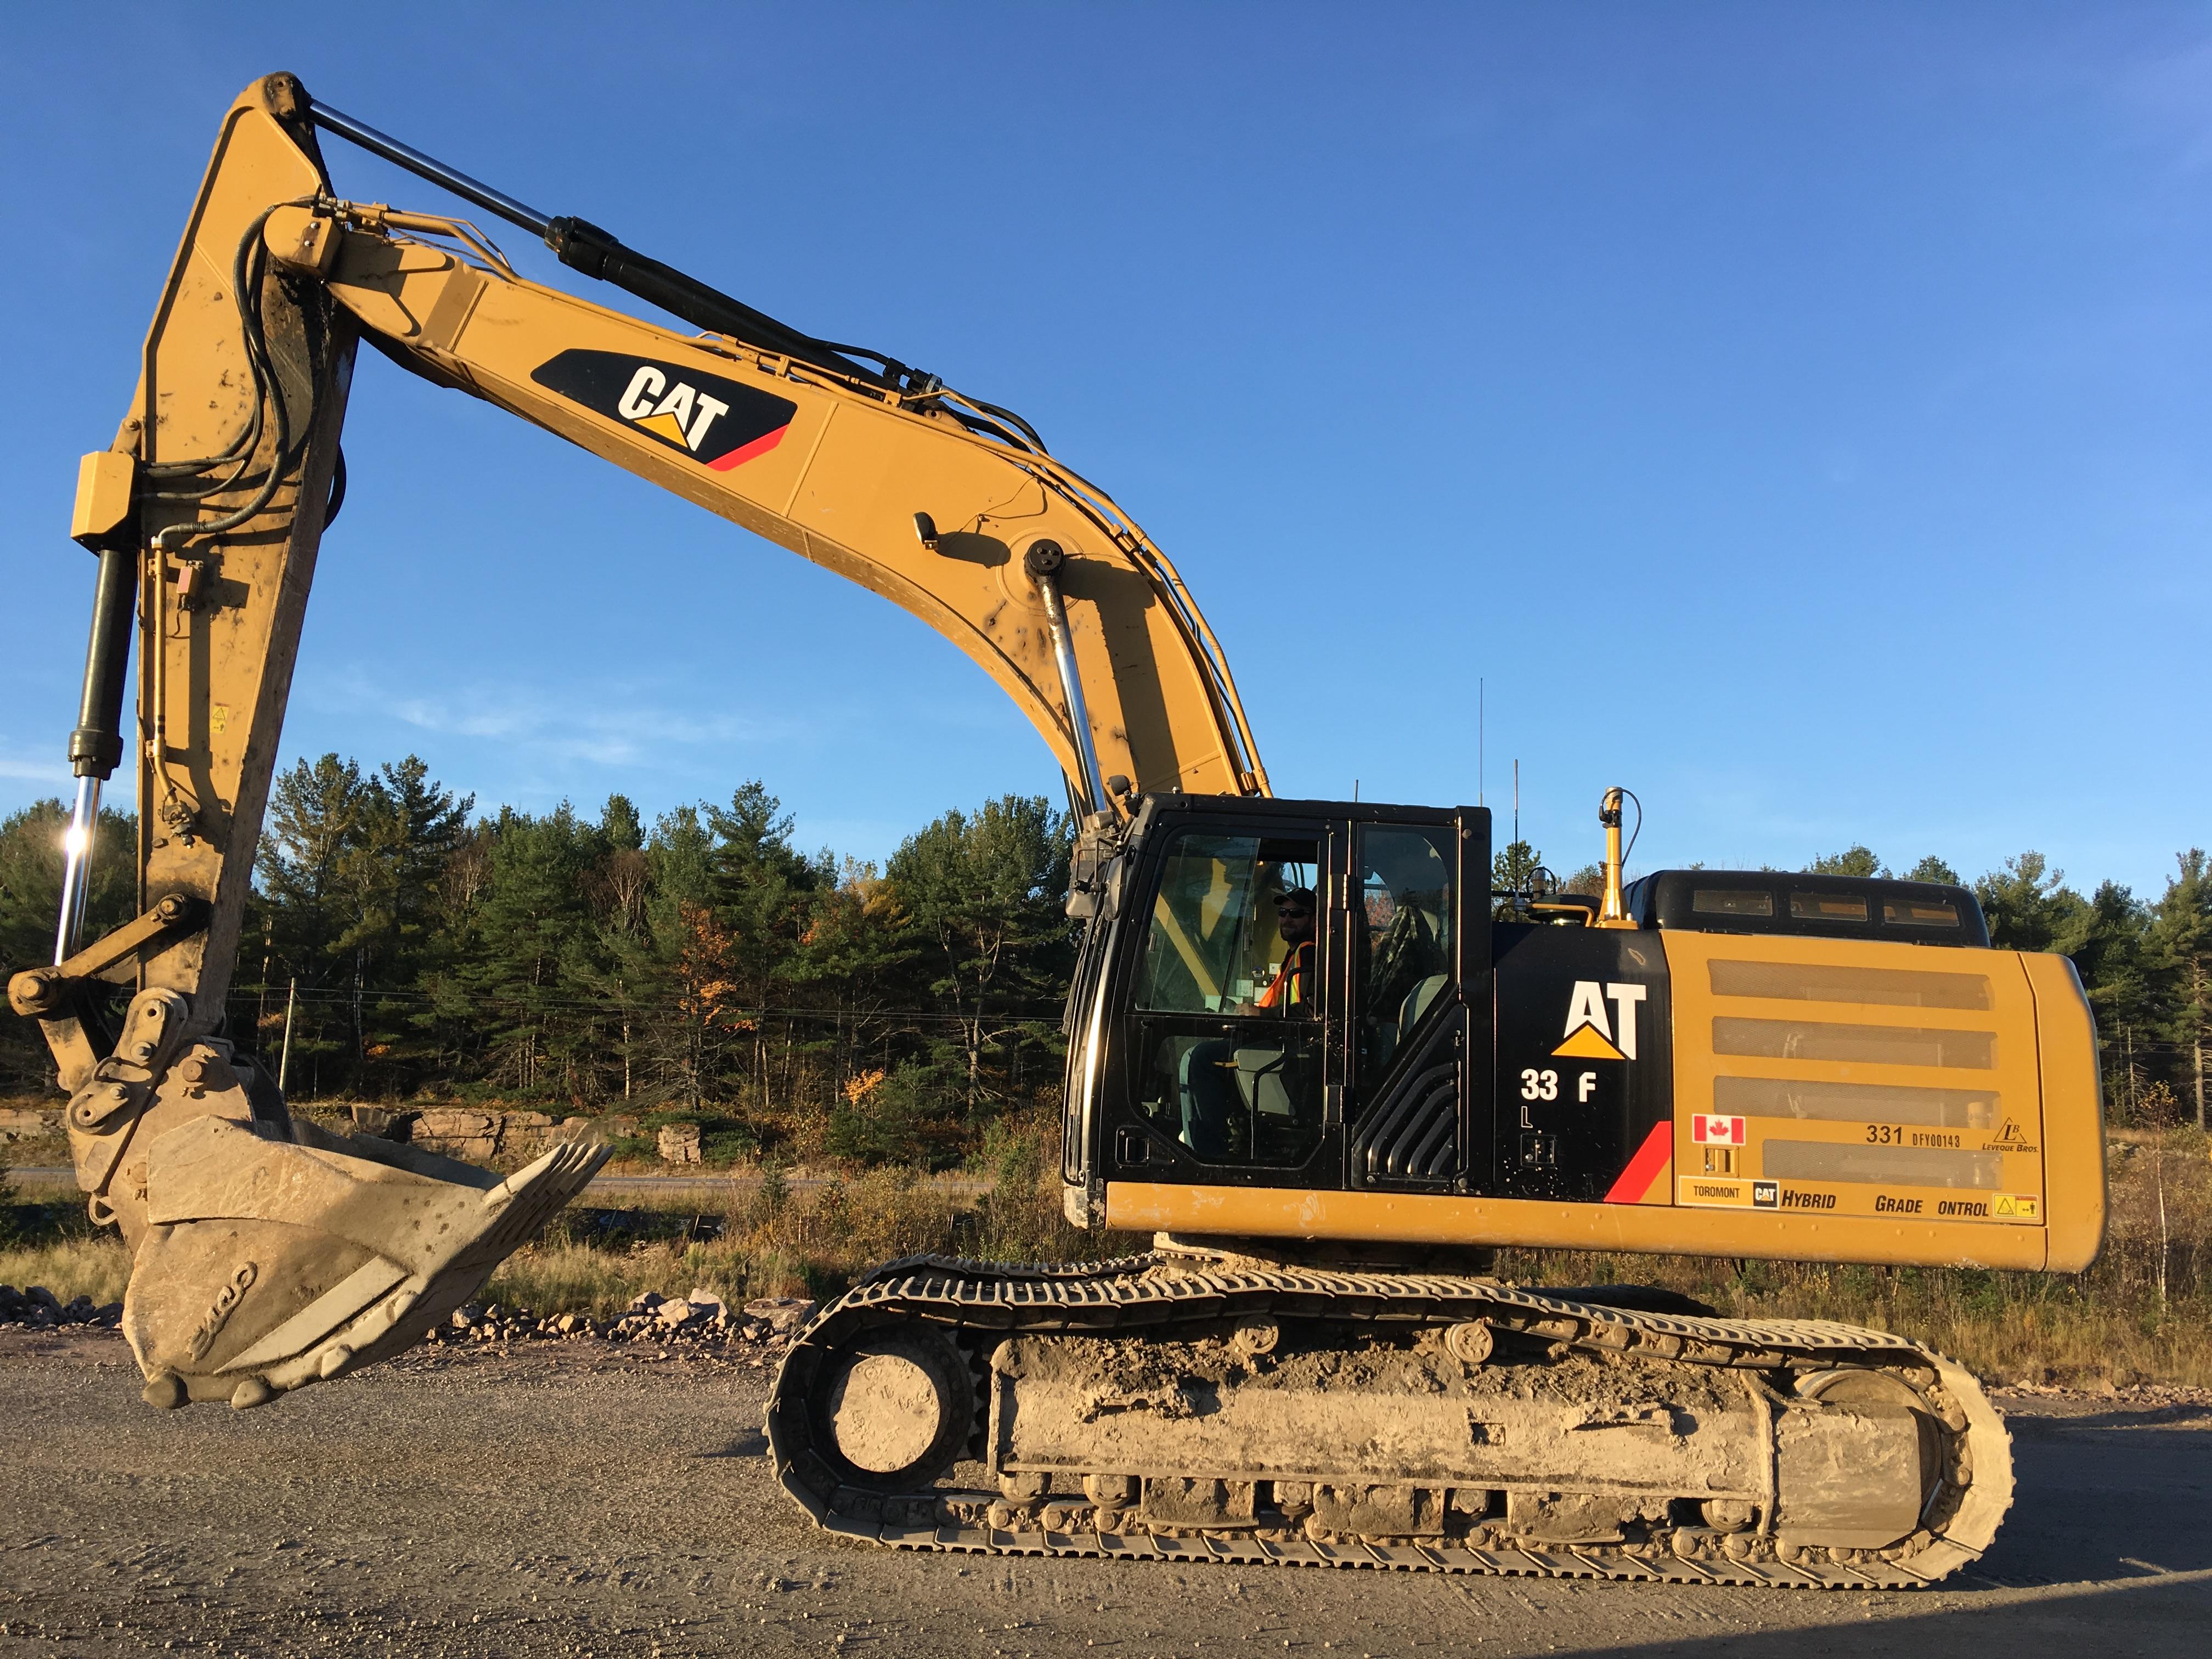 rental cat excavator available